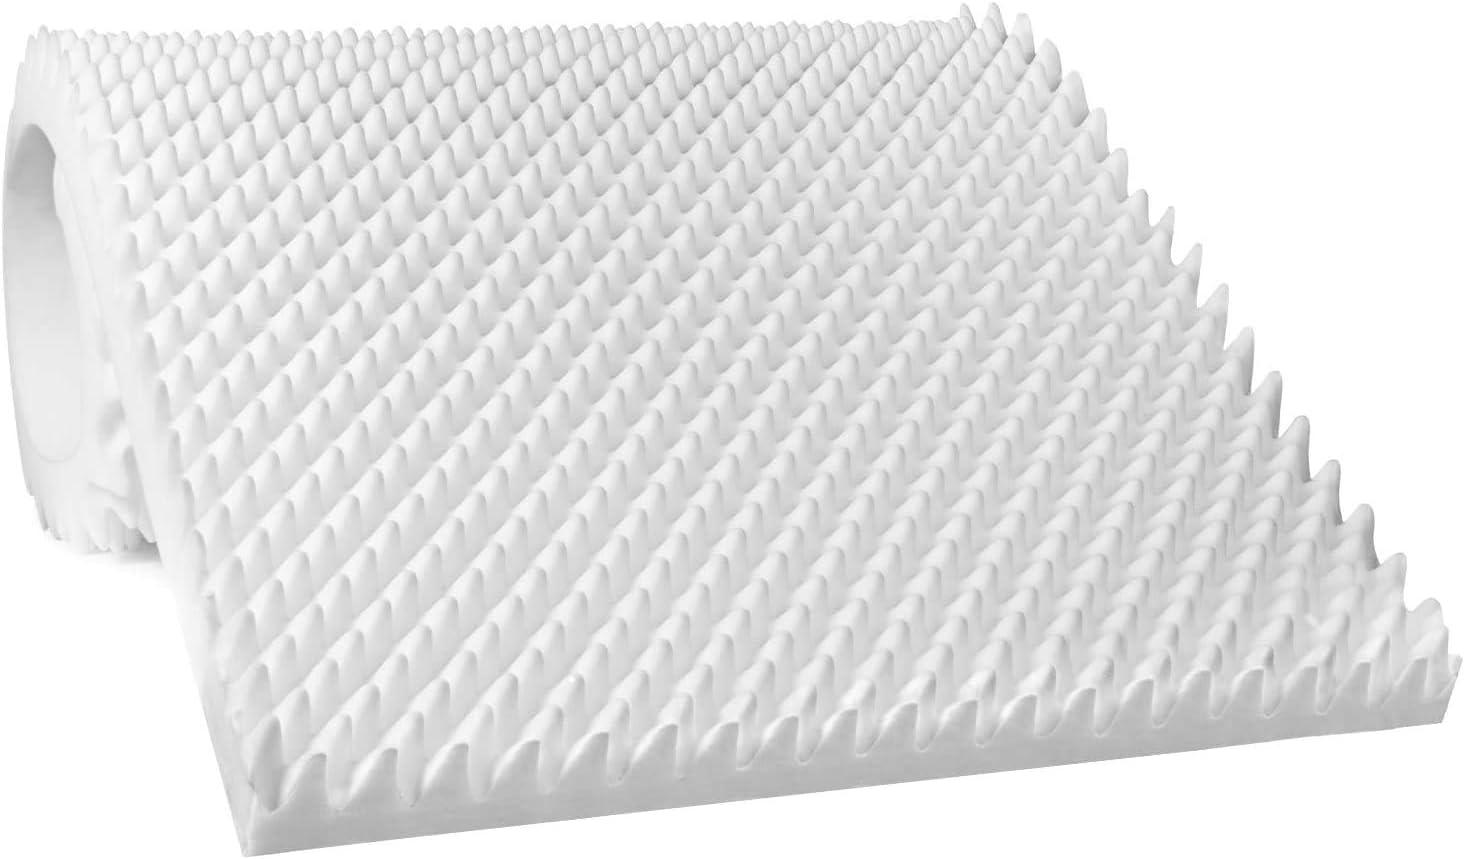 "Vaunn Medical Egg Crate Convoluted Foam Mattress Pad - 2.5"" Thick EggCrate Mattress Topper (Standard Twin Bed 38"" x 75"" x 2.5"") - Made in USA: Health & Personal Care"